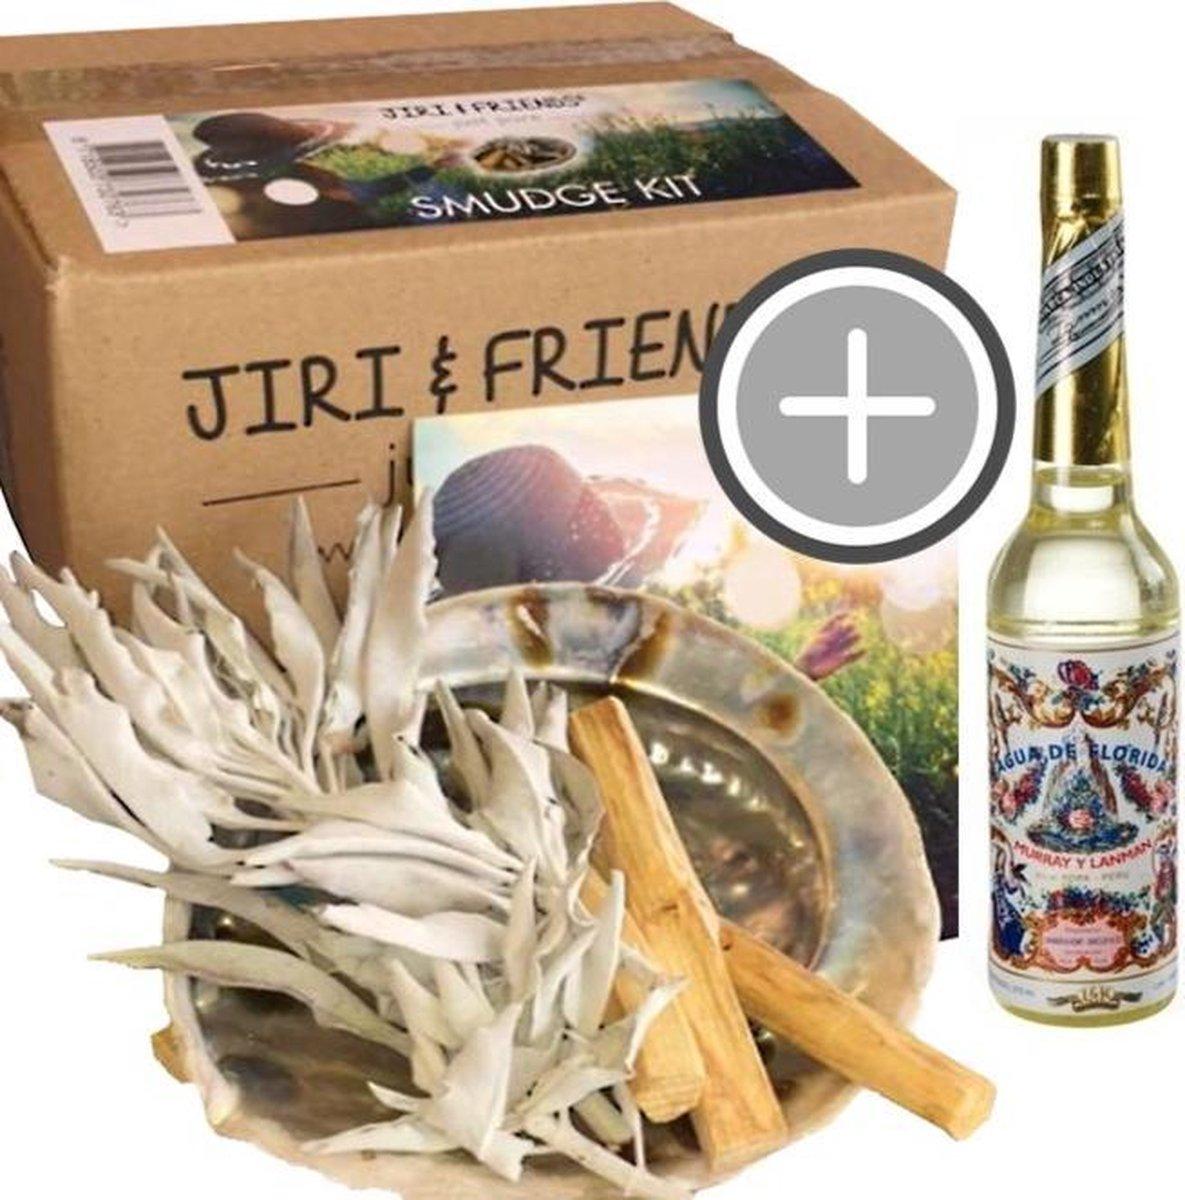 LUXE Reinig je huis pakket ORIGINAL Jiri & Friends Smudge Kit Smudgekit Witte salie Palo Santo abalone schelp | small FLORIDA WATER Agua de Florida Peru - Jiri & Friends